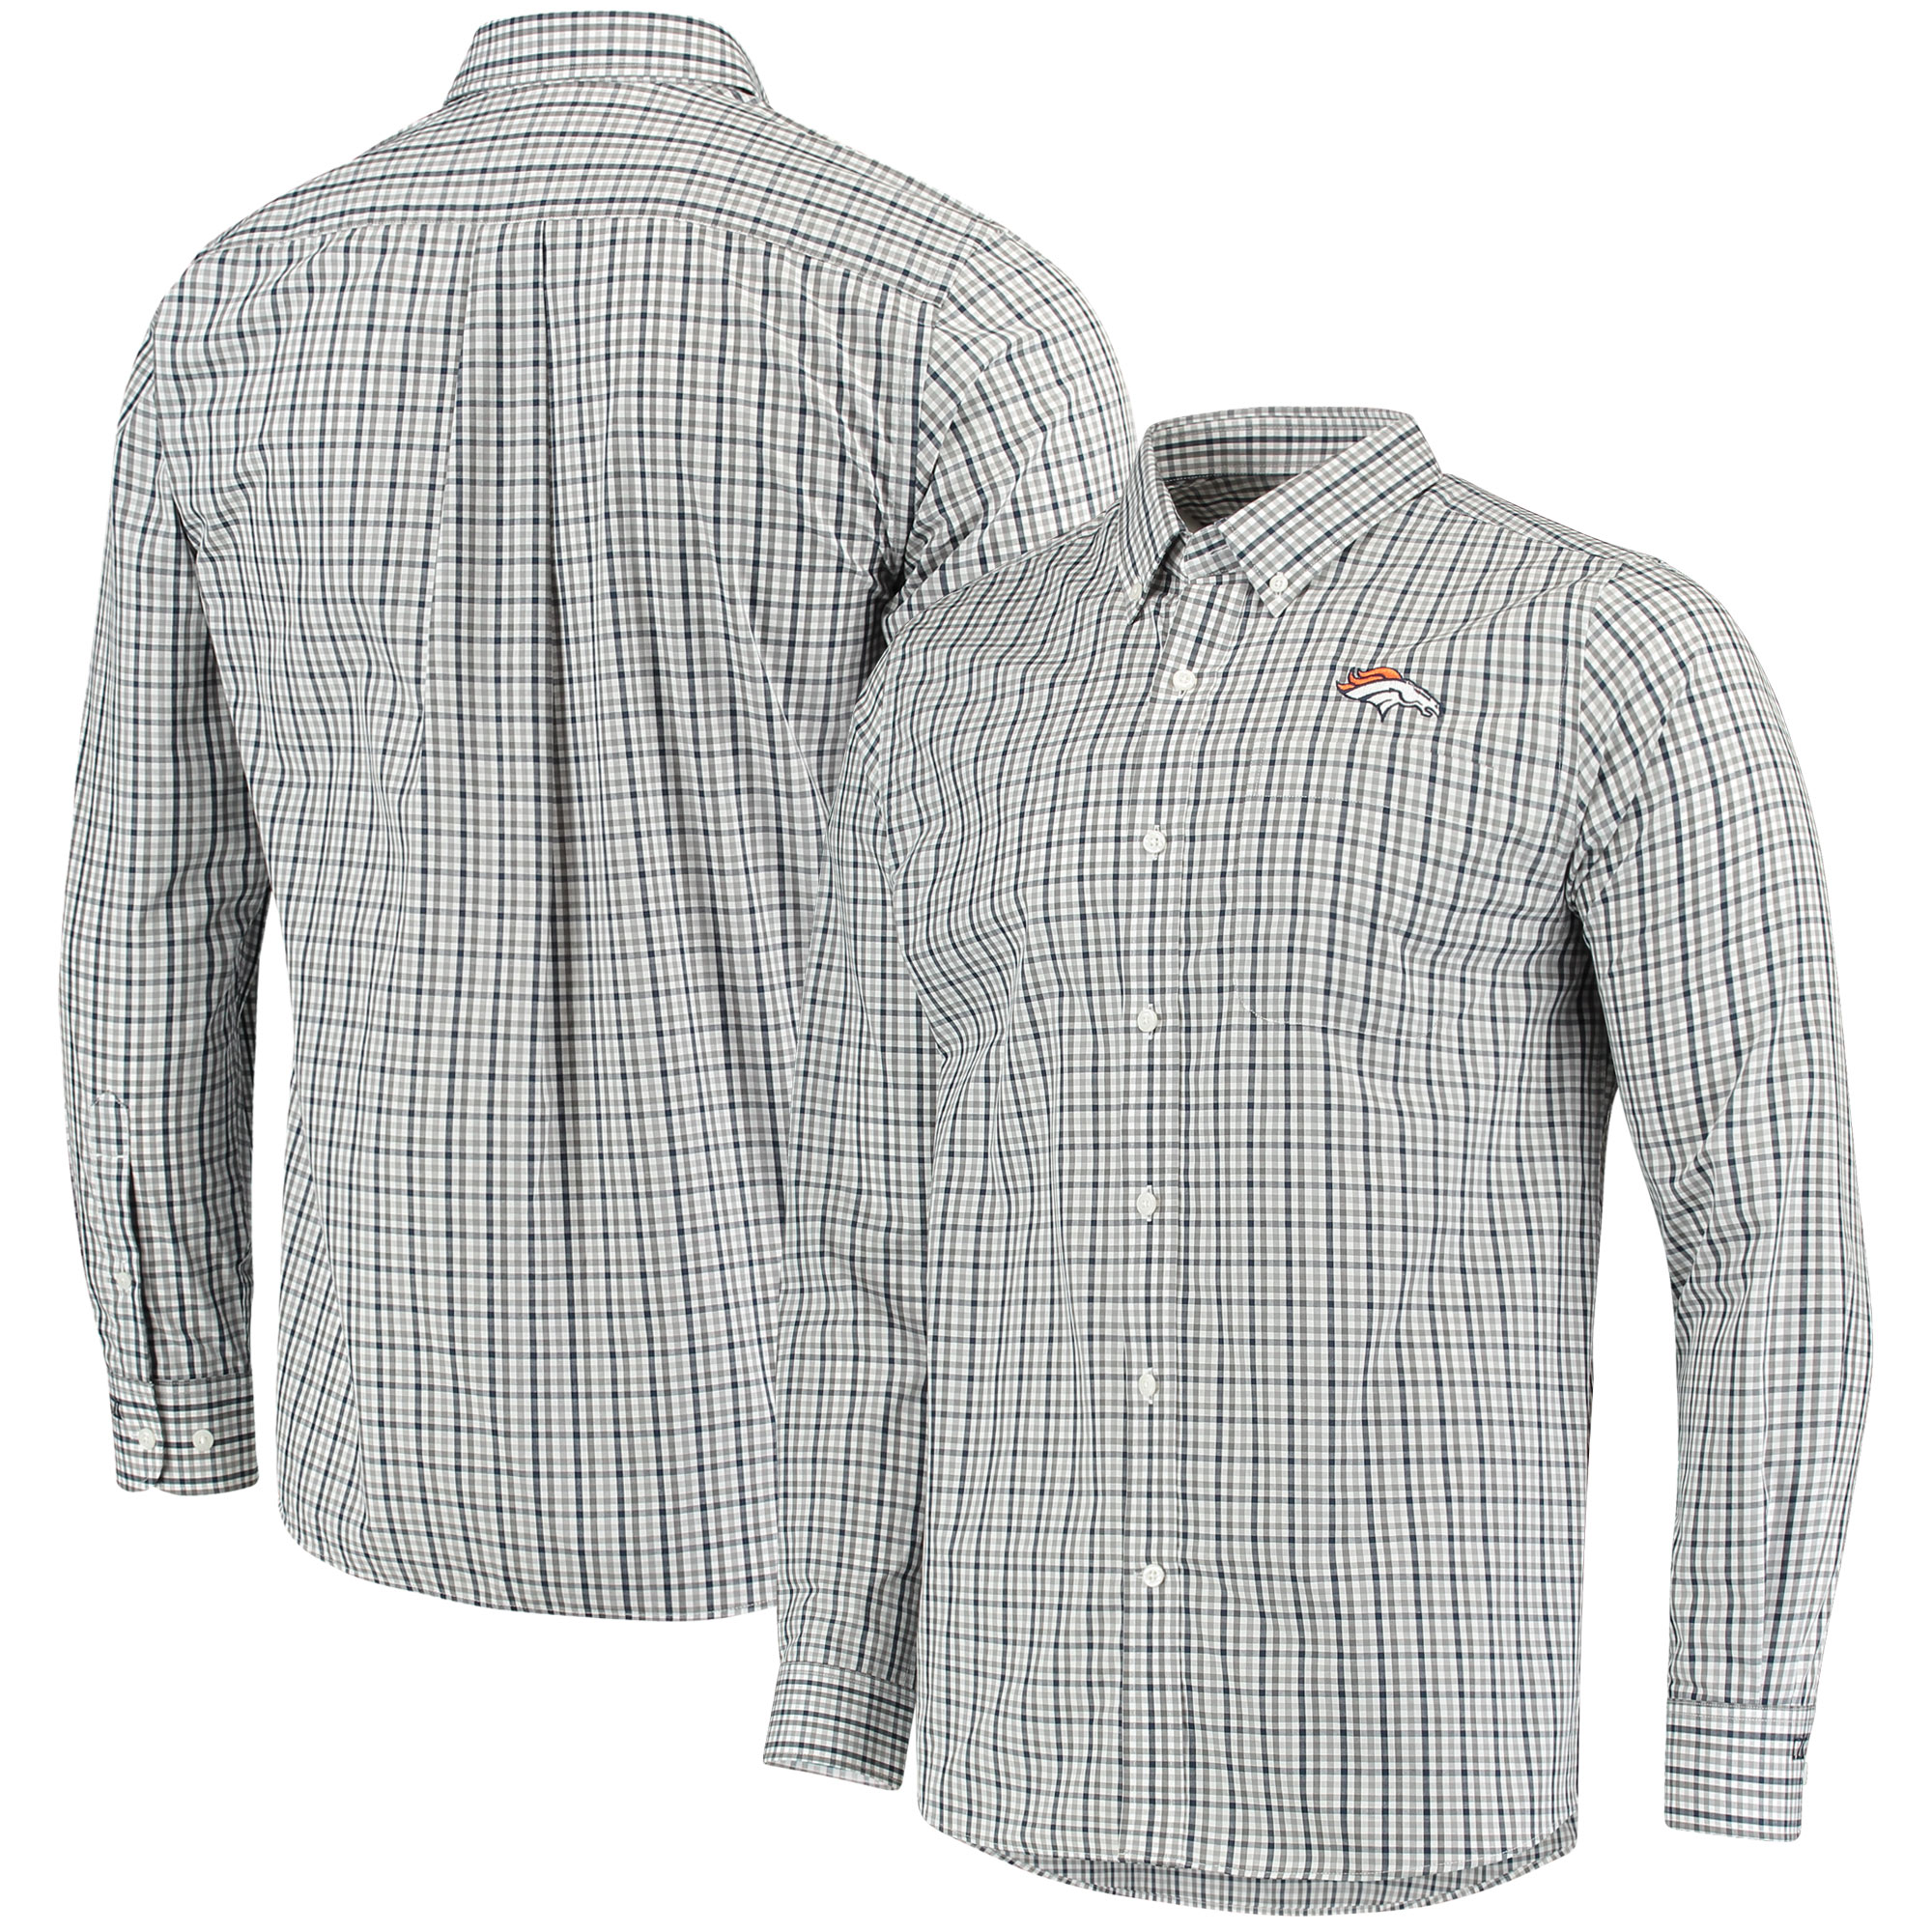 Denver Broncos Cutter & Buck Epic Easy Care Gilman Plaid Long Sleeve Button-Down Shirt - Navy